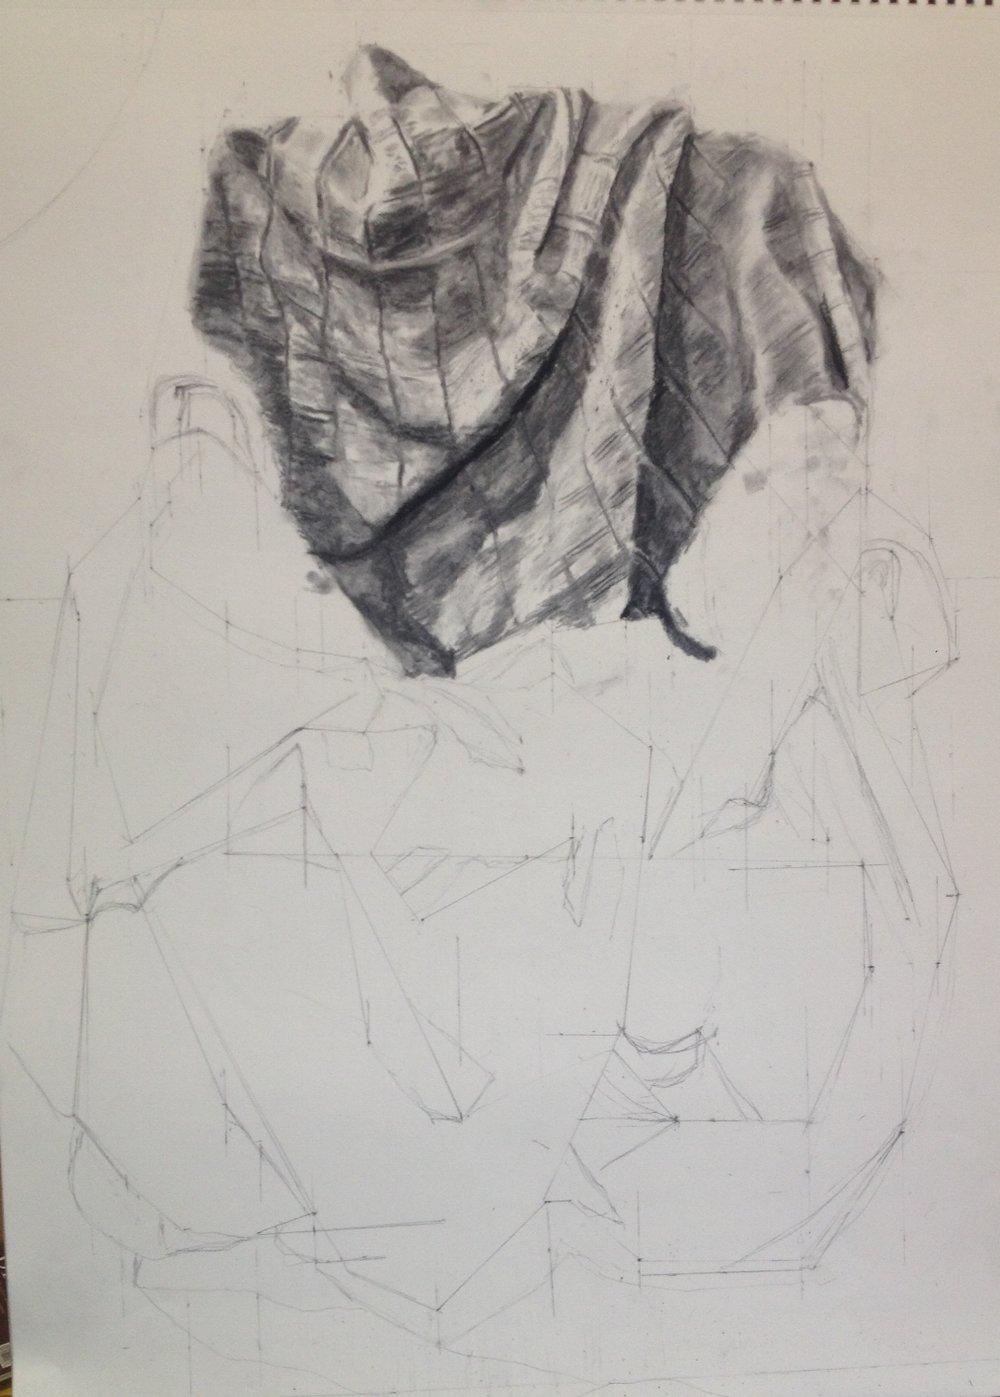 Blanket - Stage 1